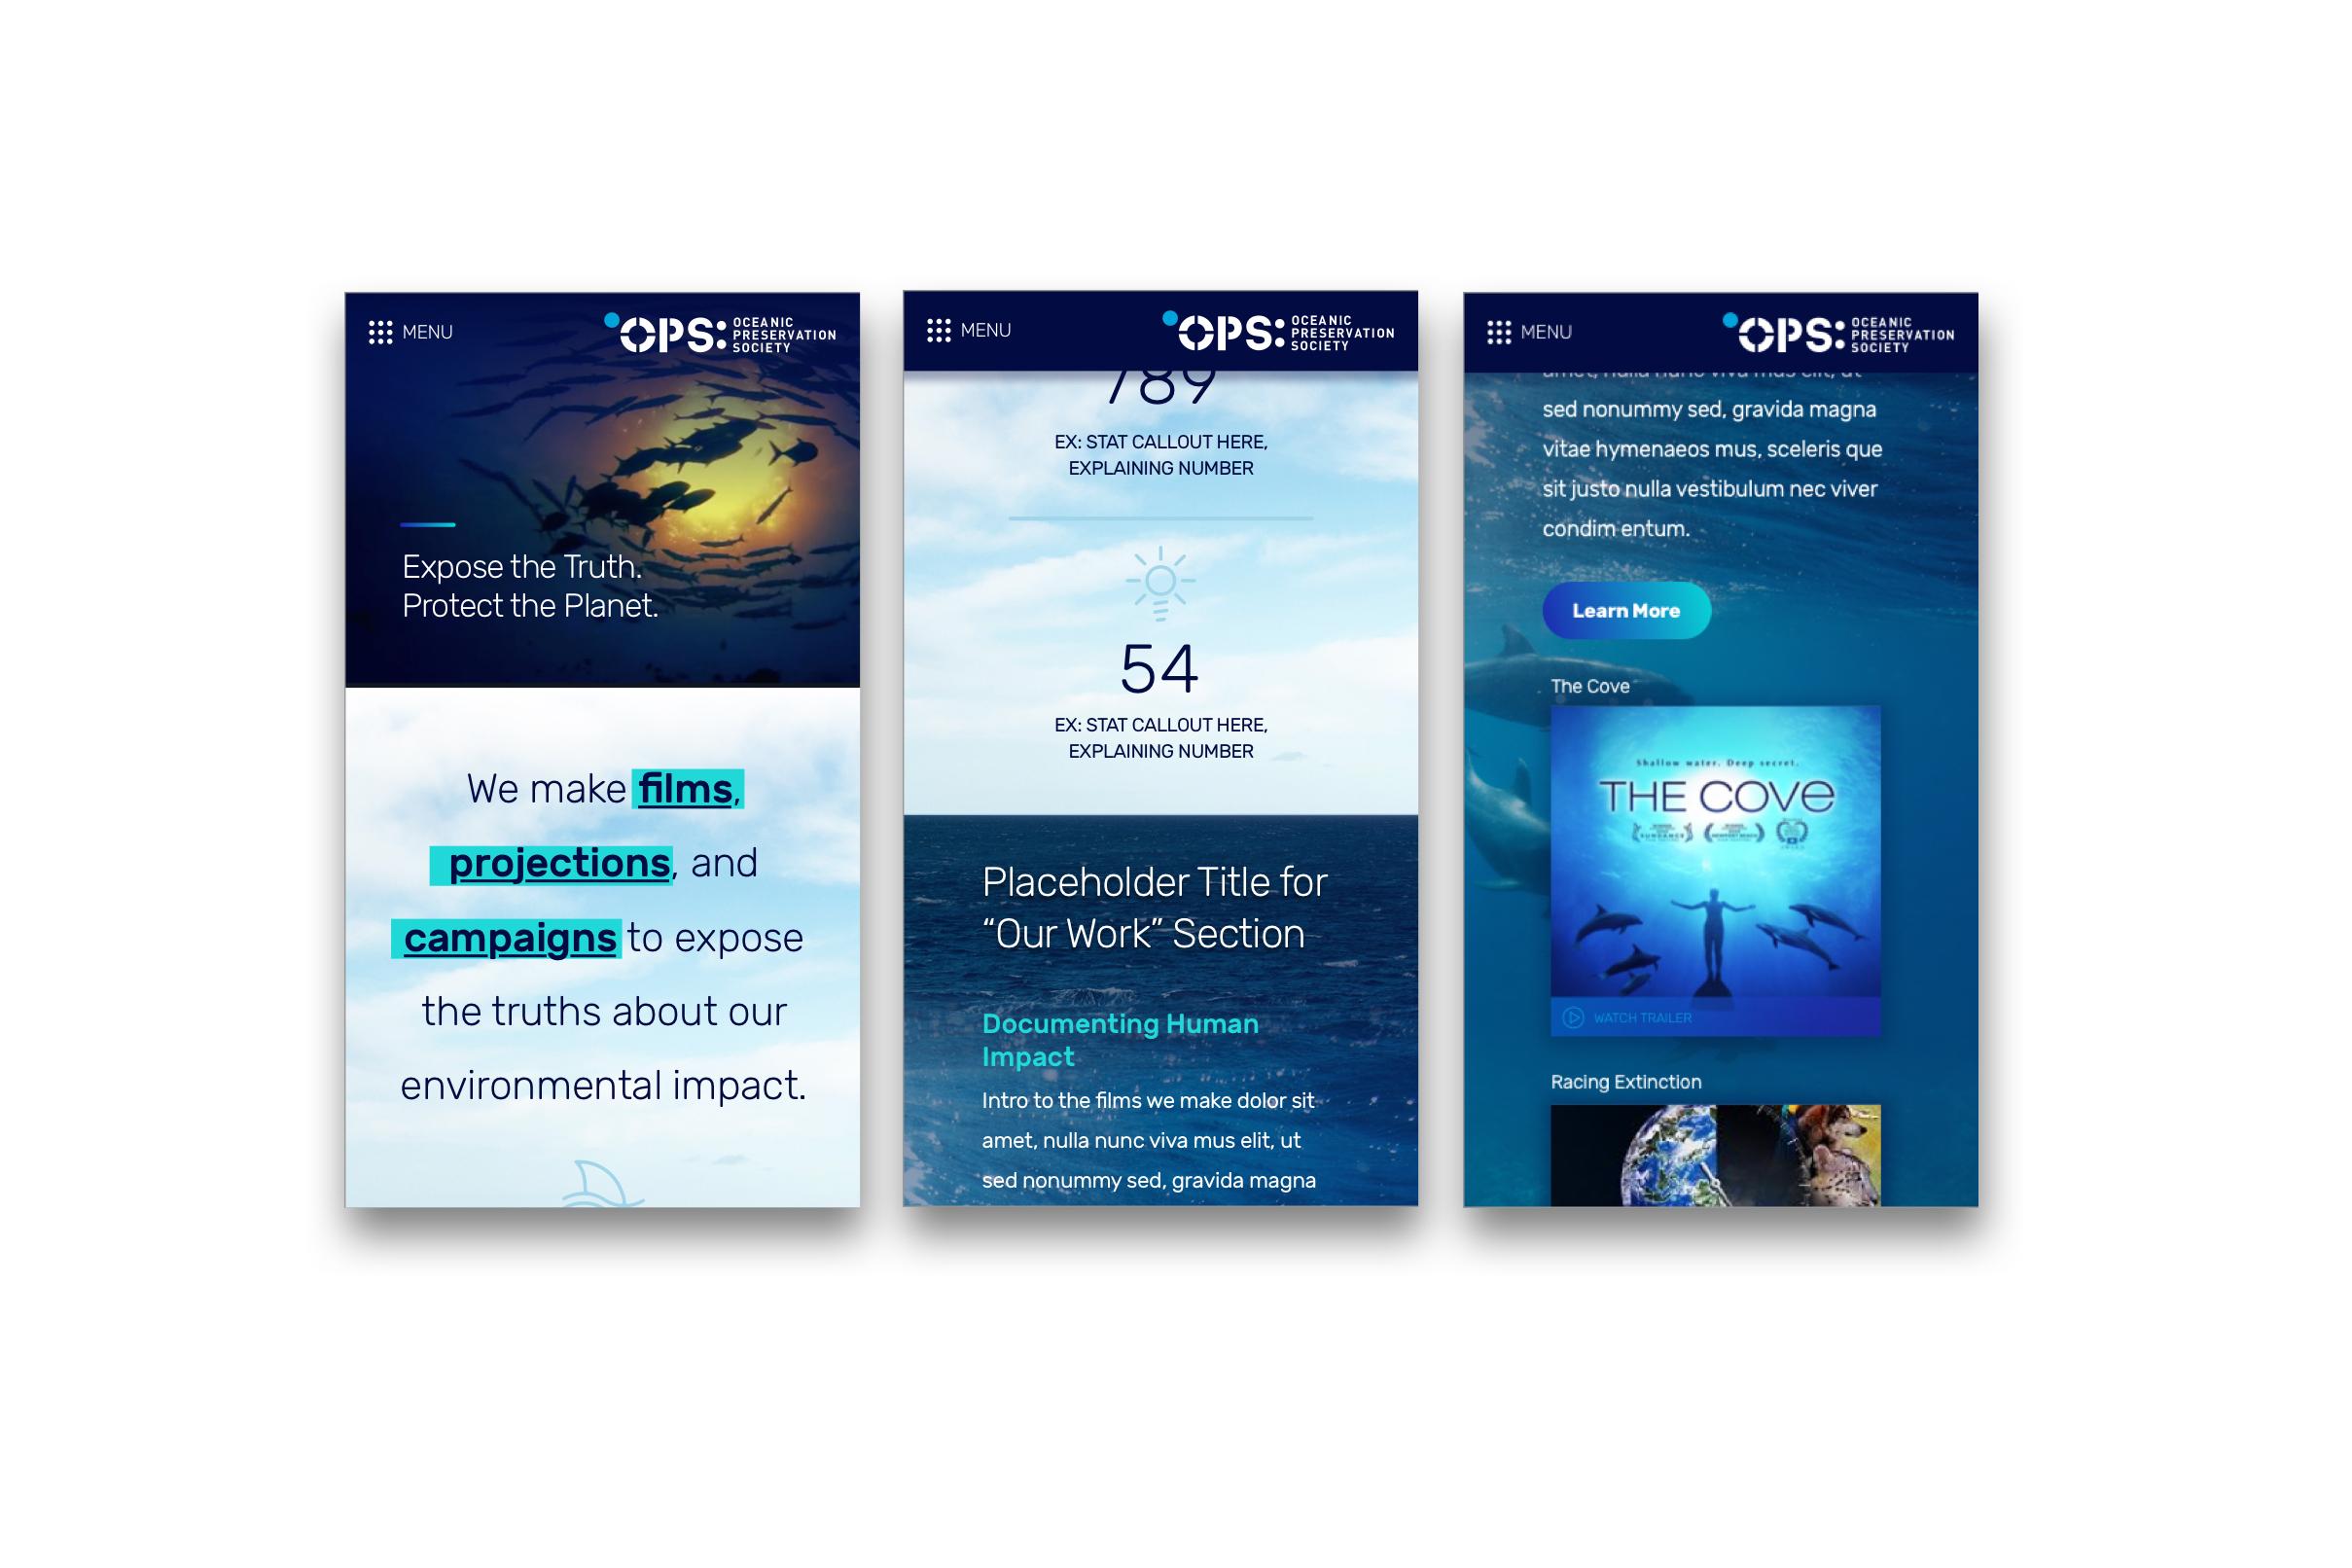 ops-slider-8 copy.jpg